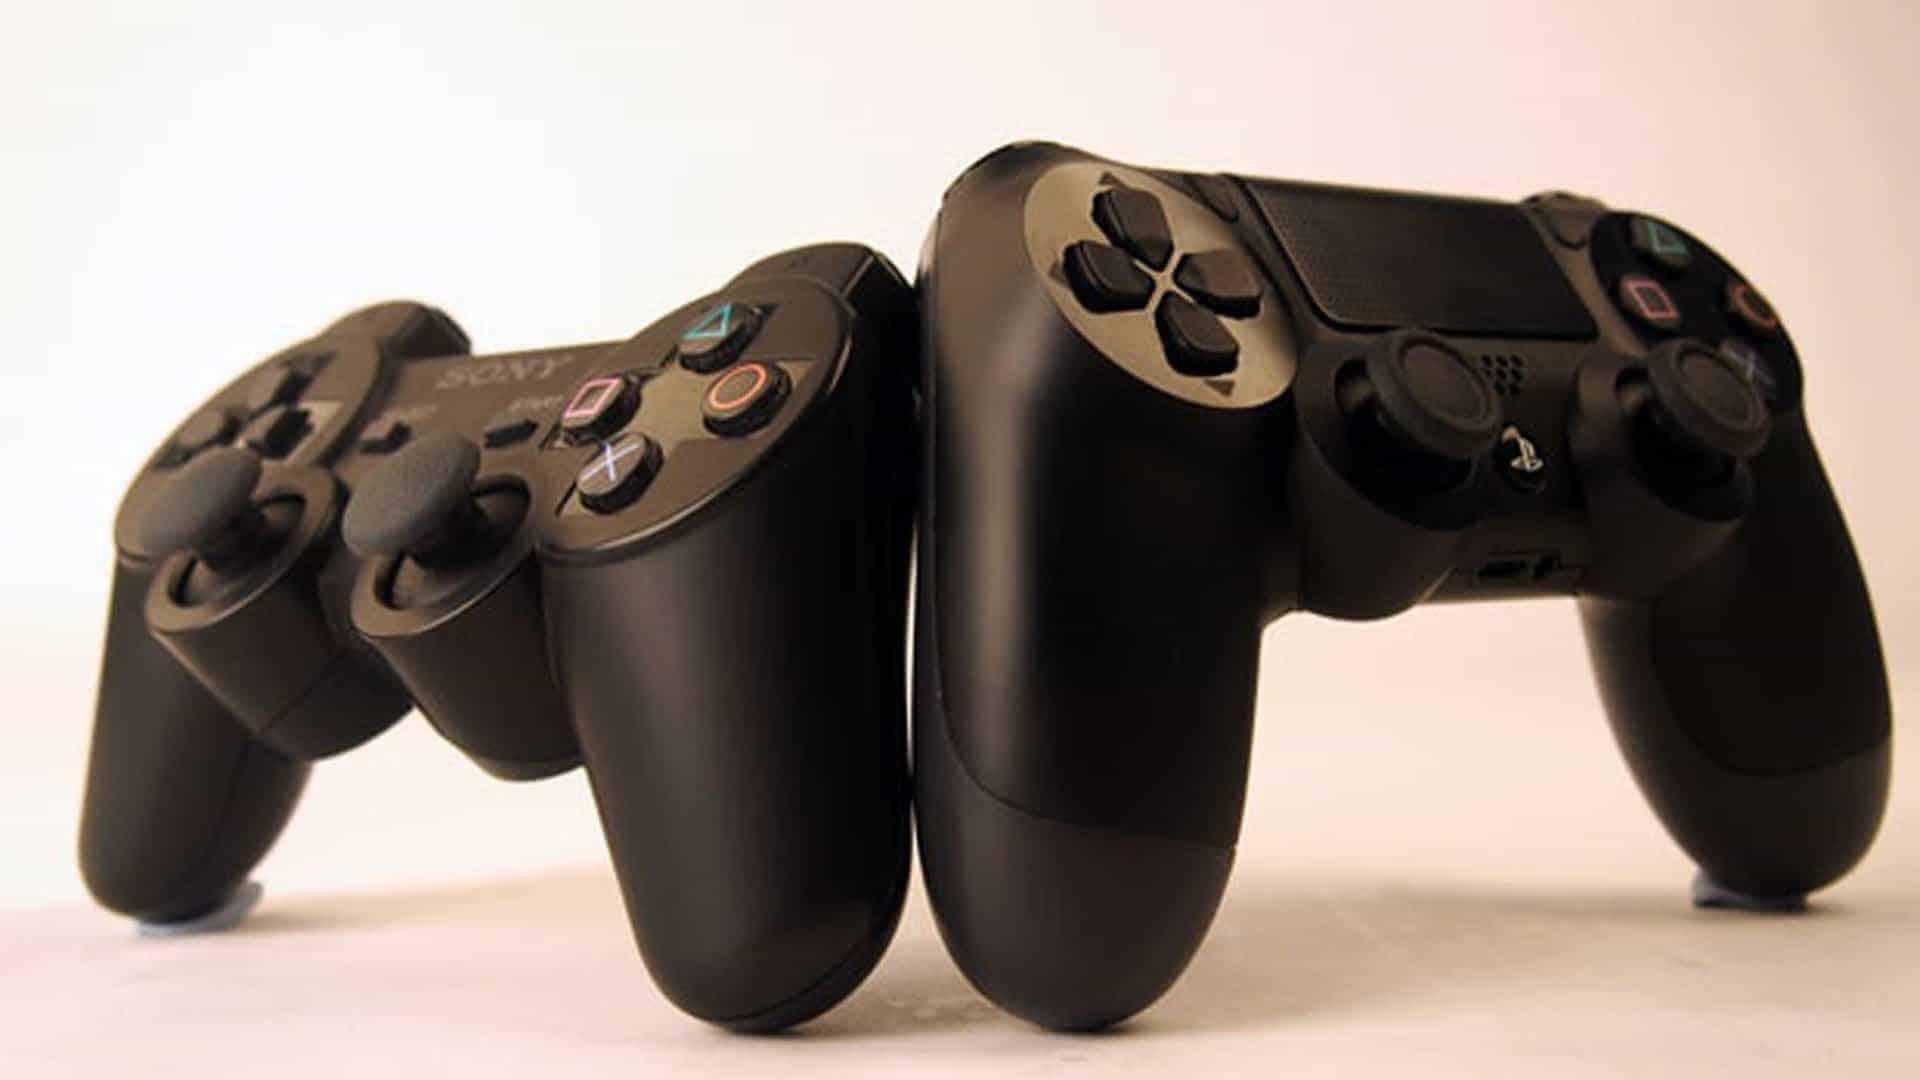 xbox one controller vs dualshock 4